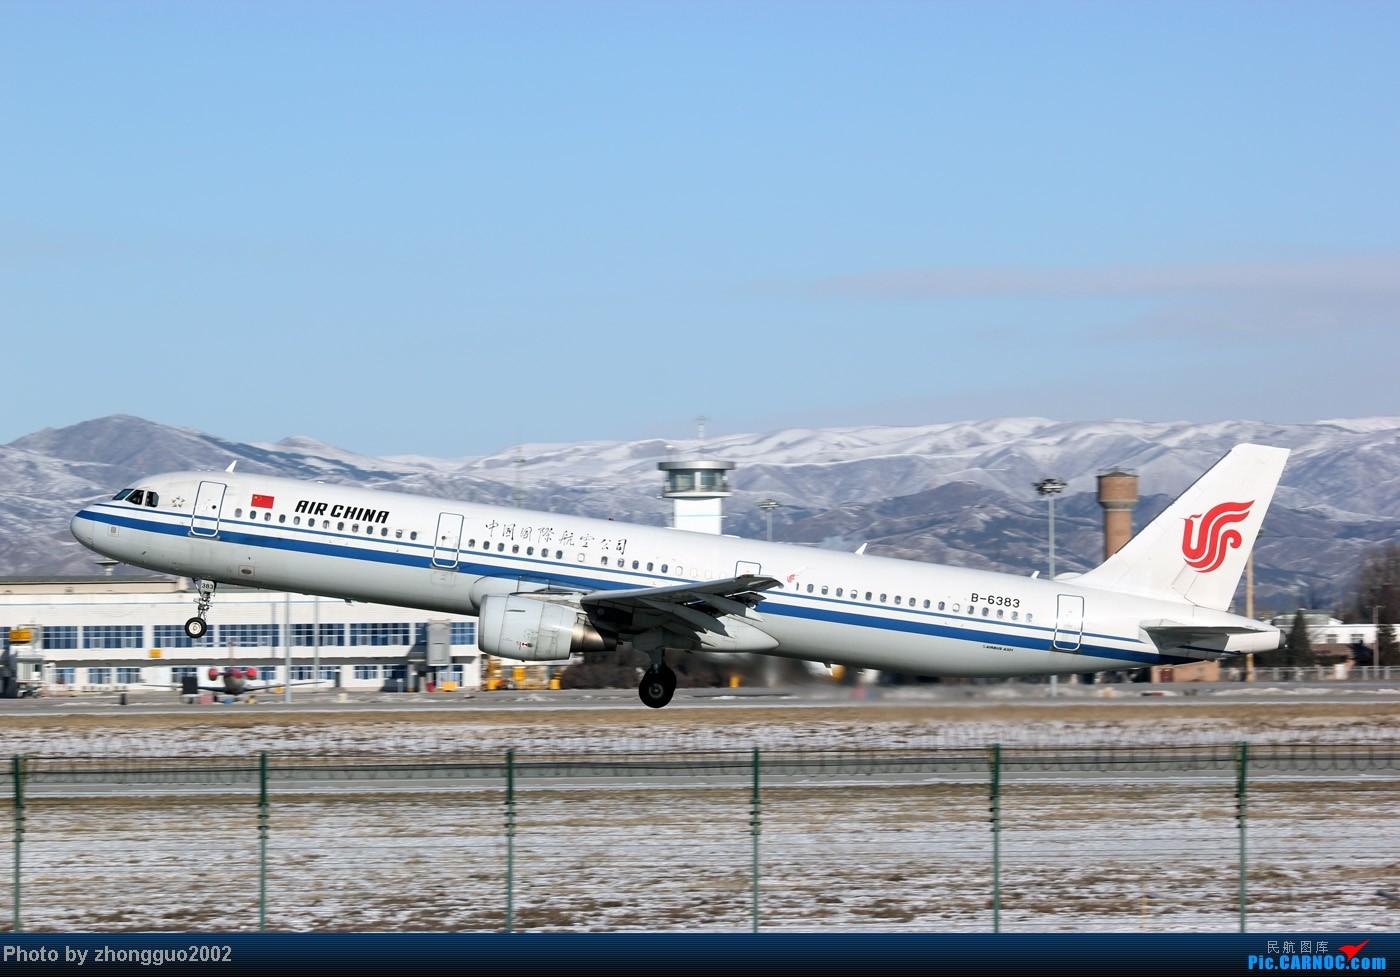 Re:[原创]随着2012年的最后一场雪的到了,我的2012年拍机工作也圆满的结束了,把这段时间里灰机整理一下,把没发的,我个人认为好的发上来! AIRBUS A321-200 B-6383 中国呼和浩特白塔国际机场